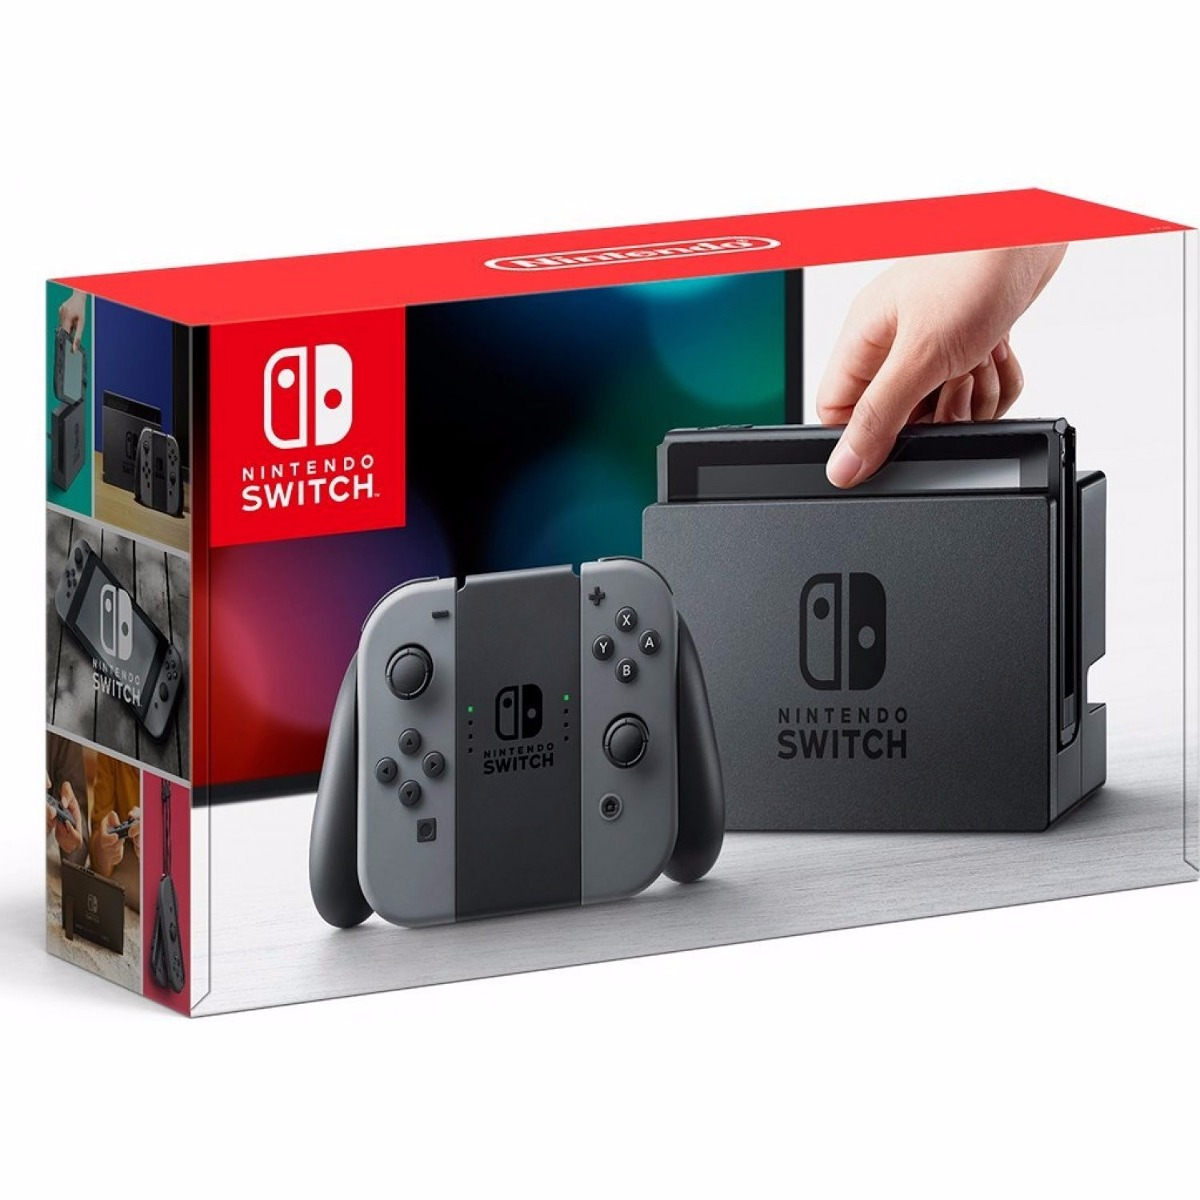 Nintendo Switch Cinza Desbloqueio Xaw 1007 - Pode Retirar - R  2.499 ... 07ee606f4c802